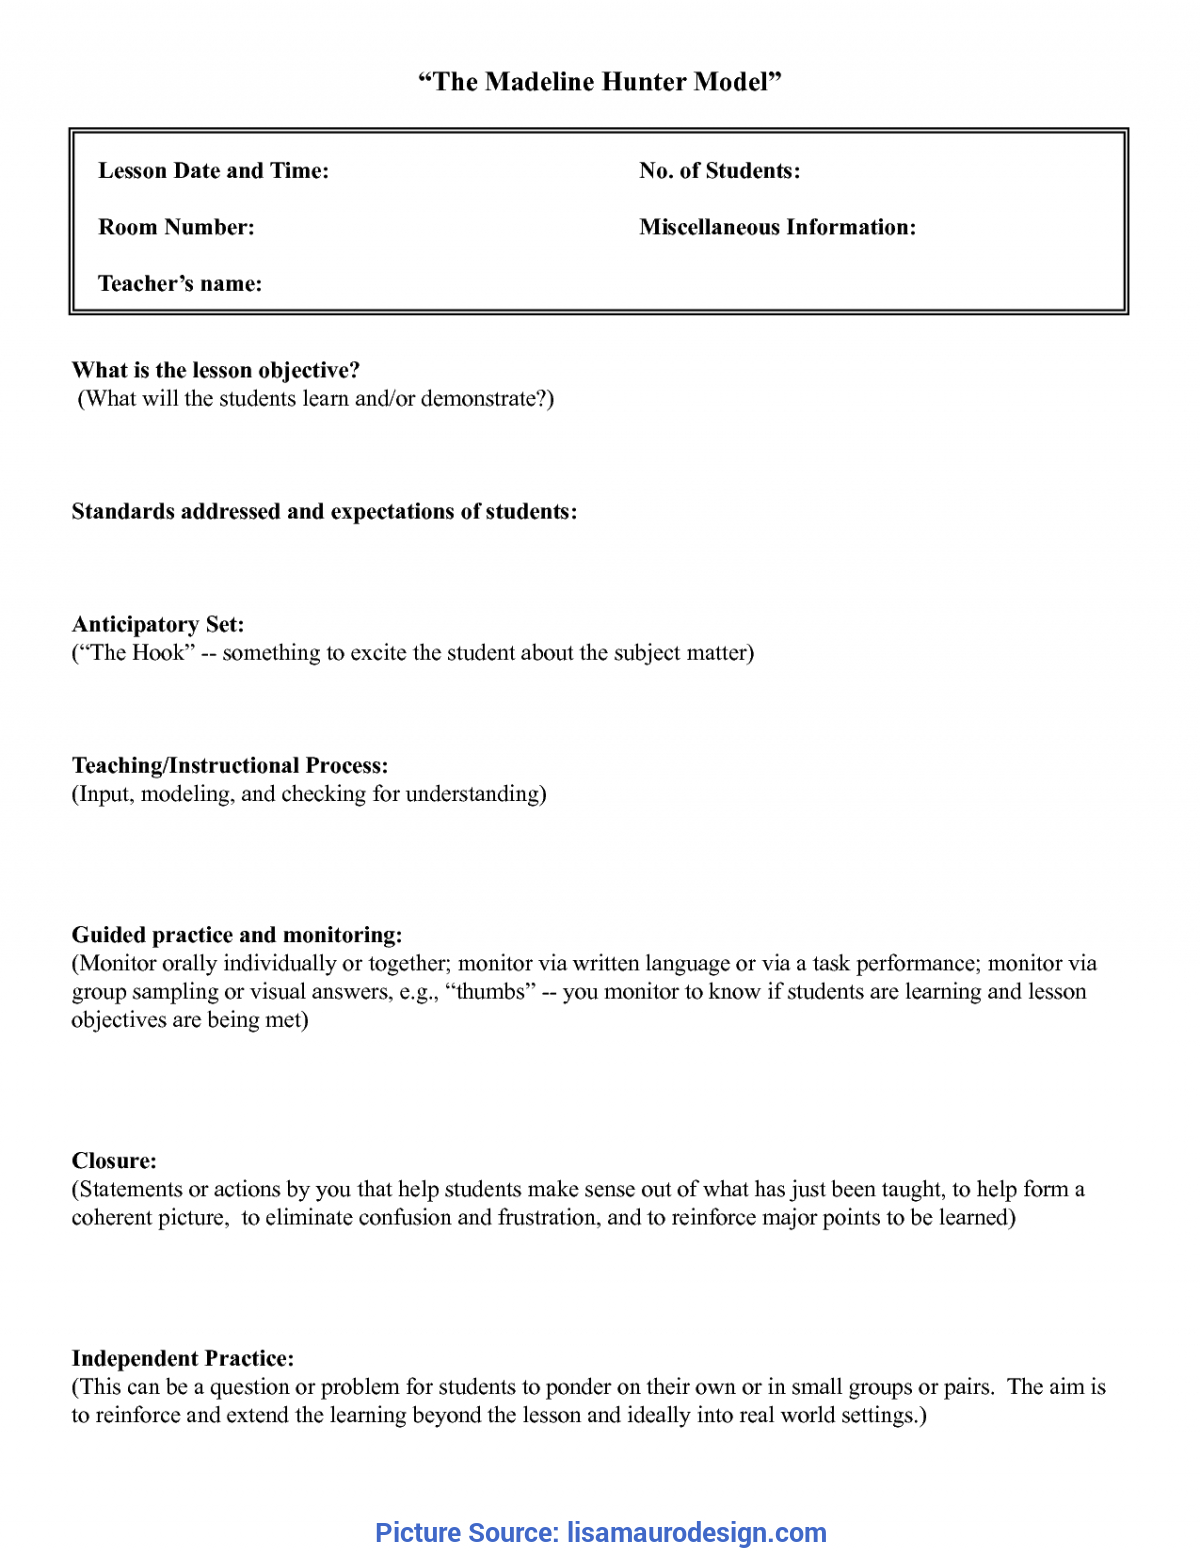 Best Lesson Plan Template Anticipatory Set Madeline Hunter Intended For Madeline Hunter Lesson Plan Blank Template